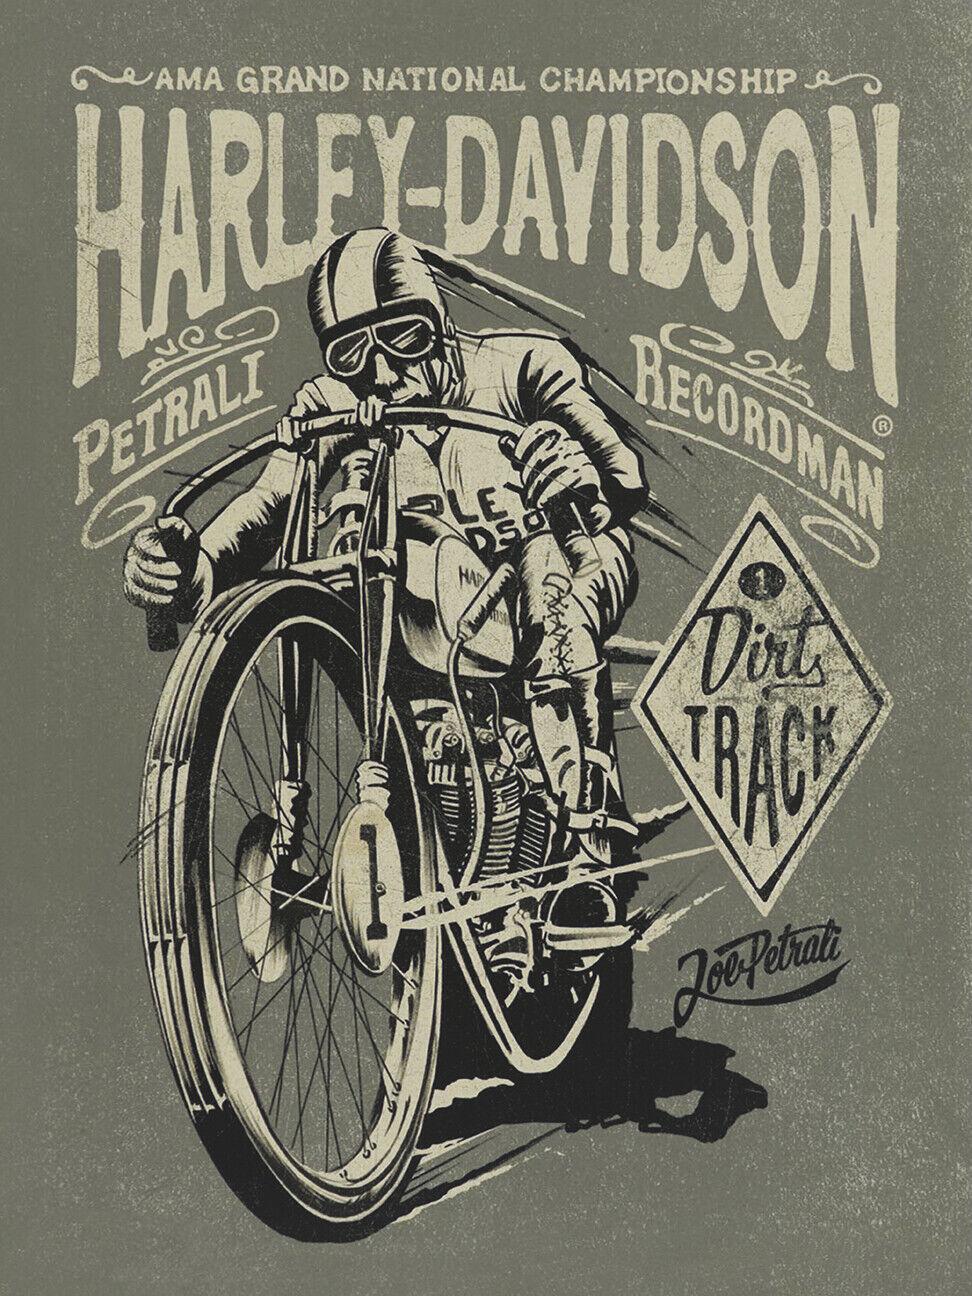 Harley Davidson Motorcycles Poster 30 Evolution 24 X 36 Motorcycle 1903 2013 For Sale Online Ebay